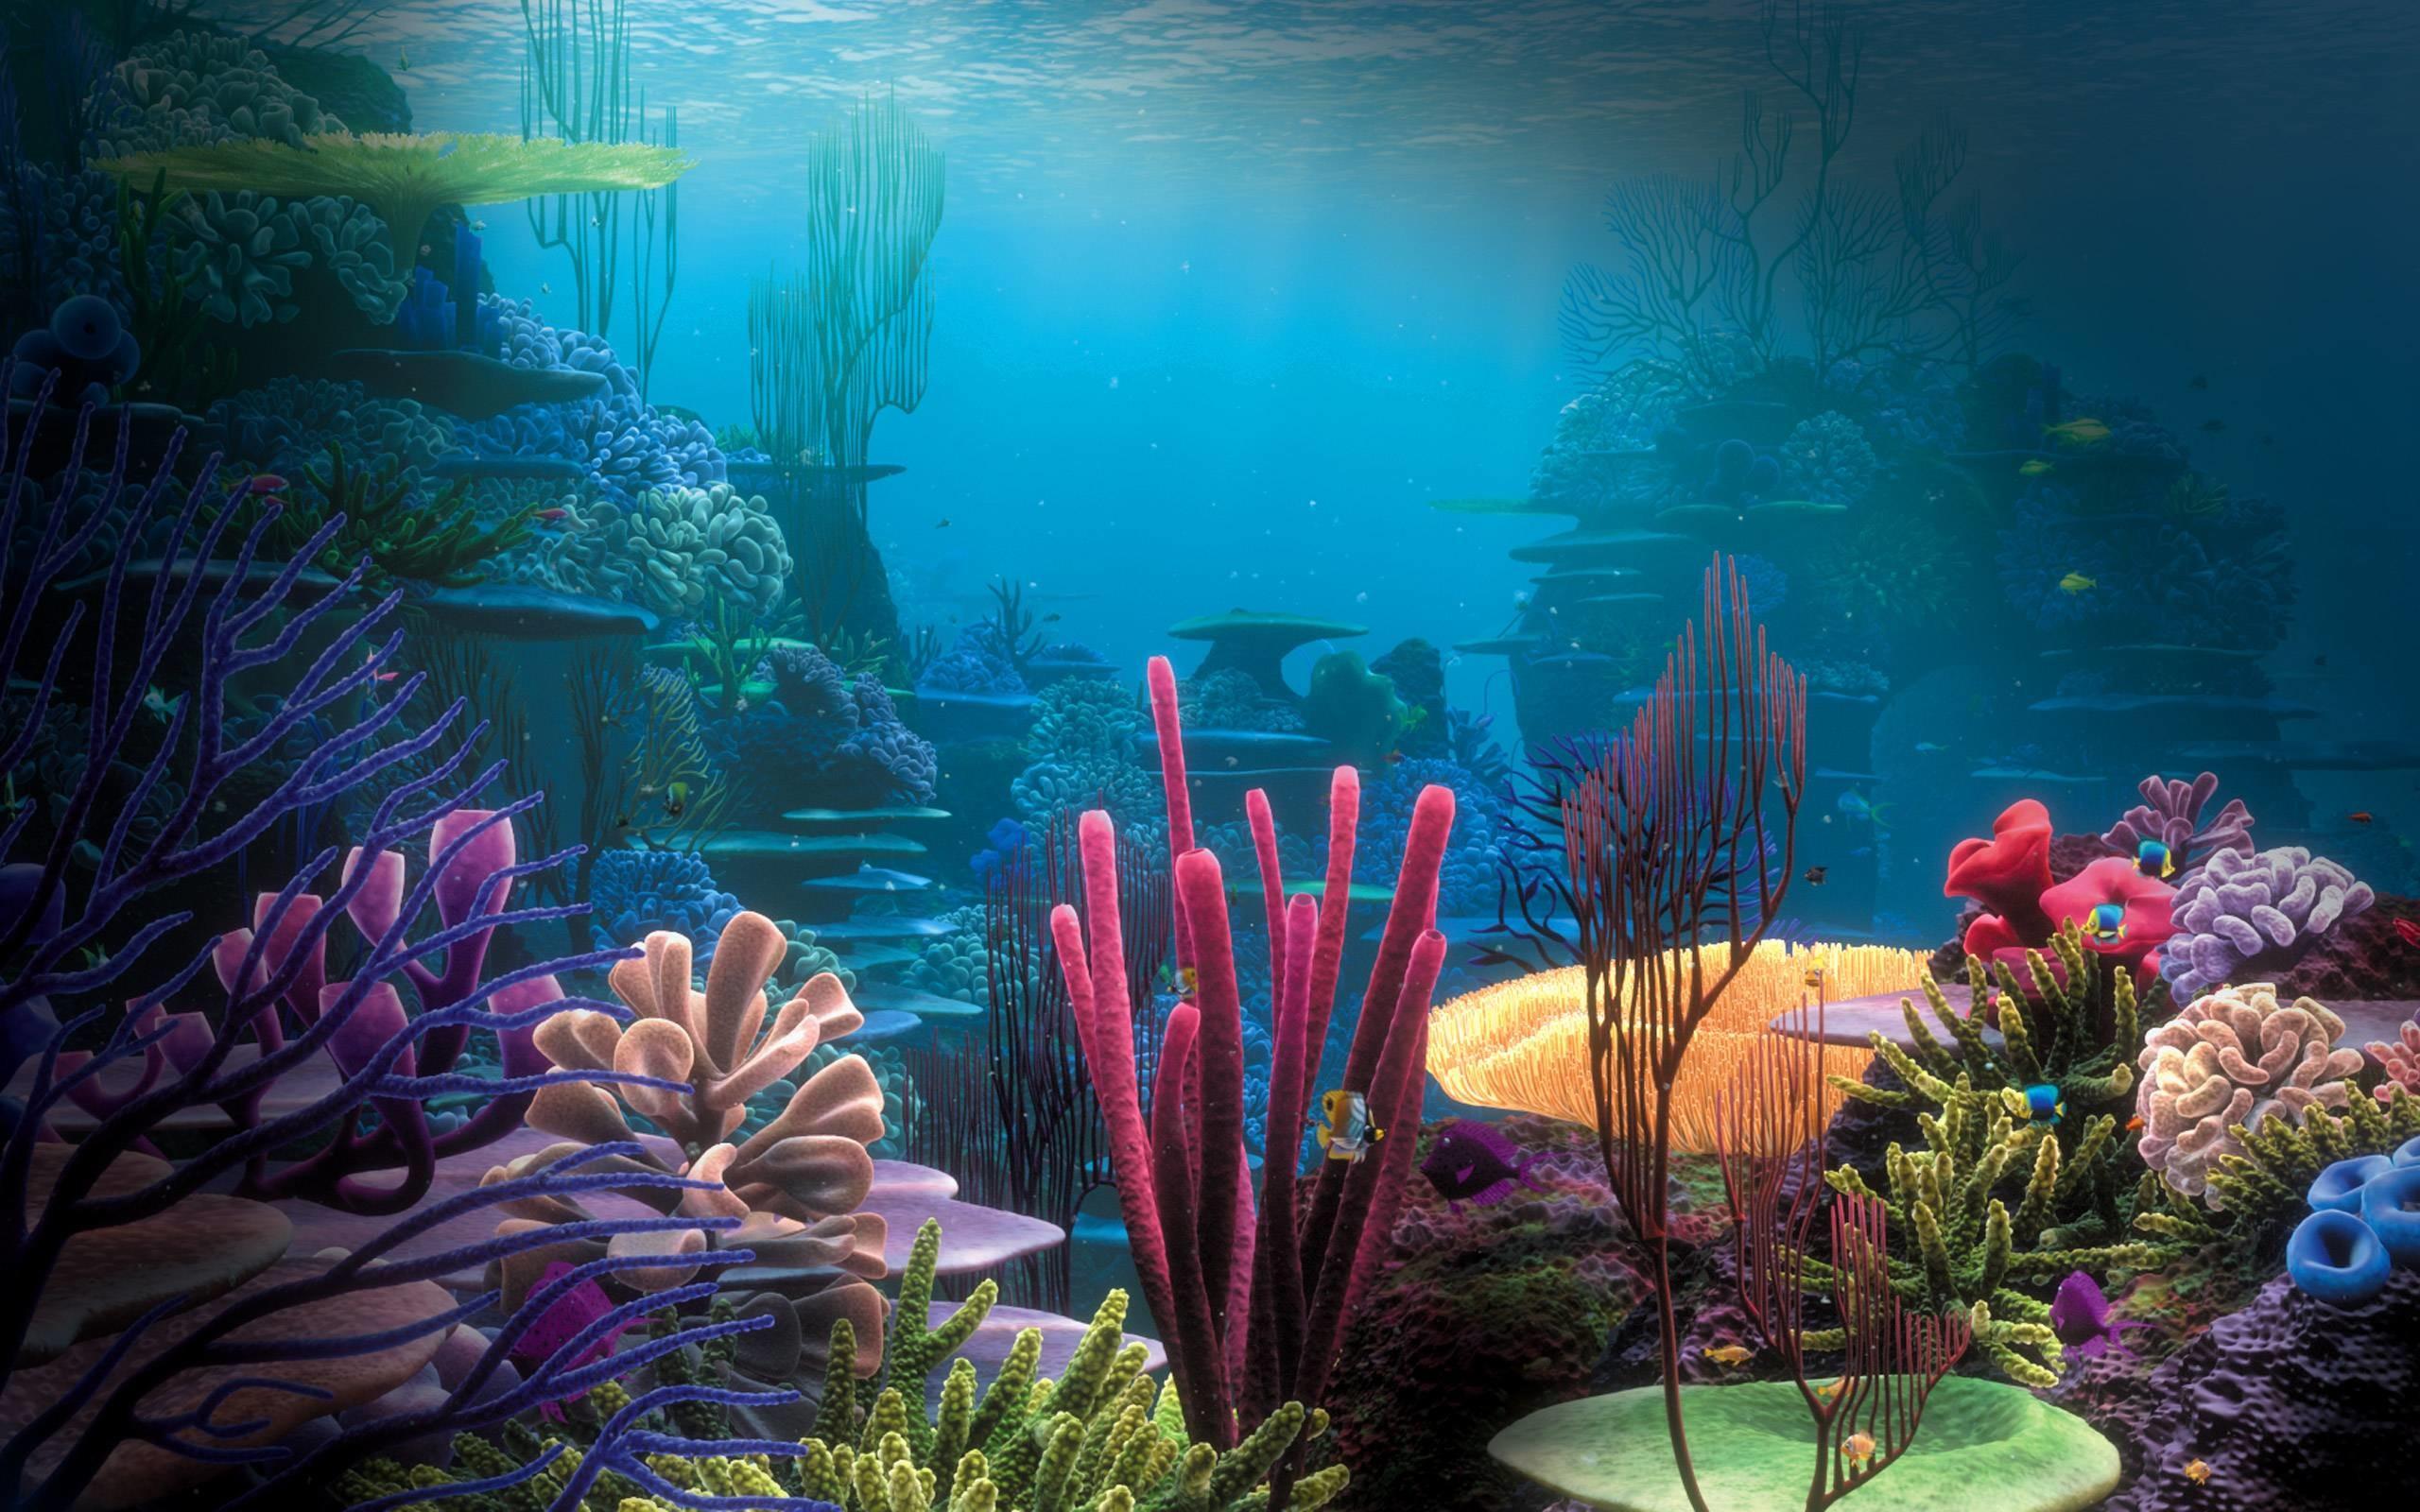 Ocean Underwater Wallpaper HD Free Download.